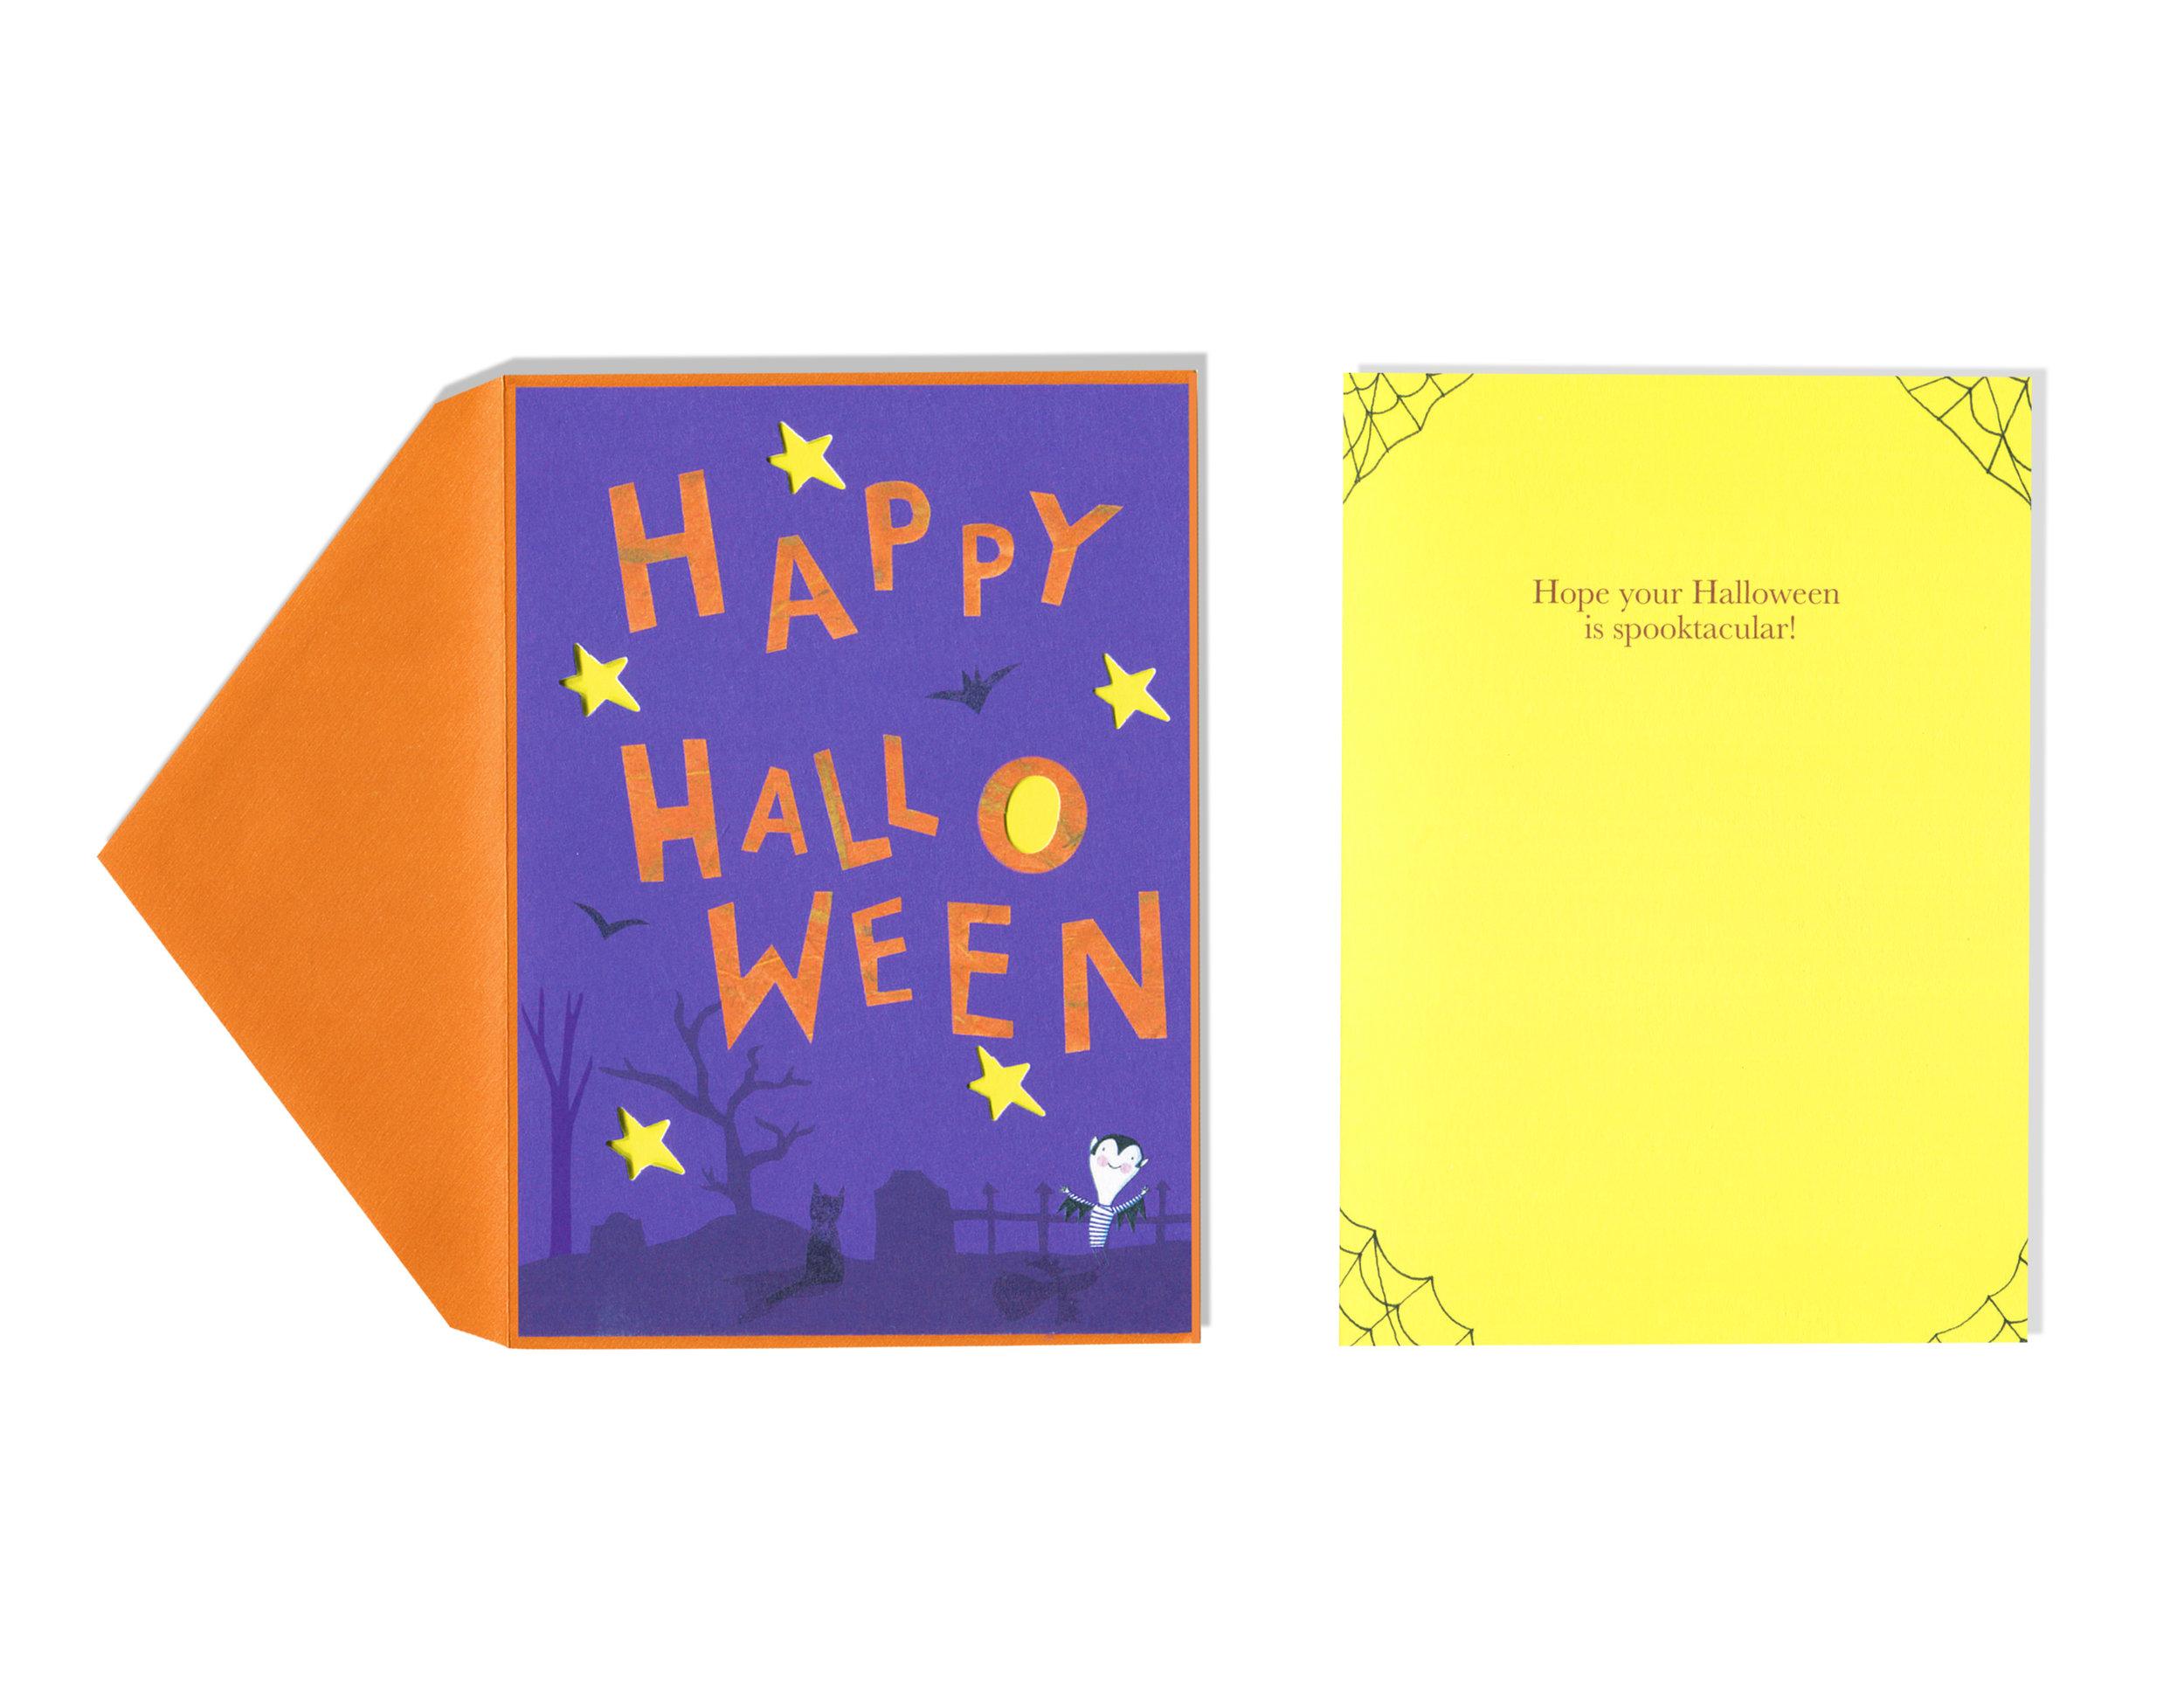 sample greeting card image spread.jpg